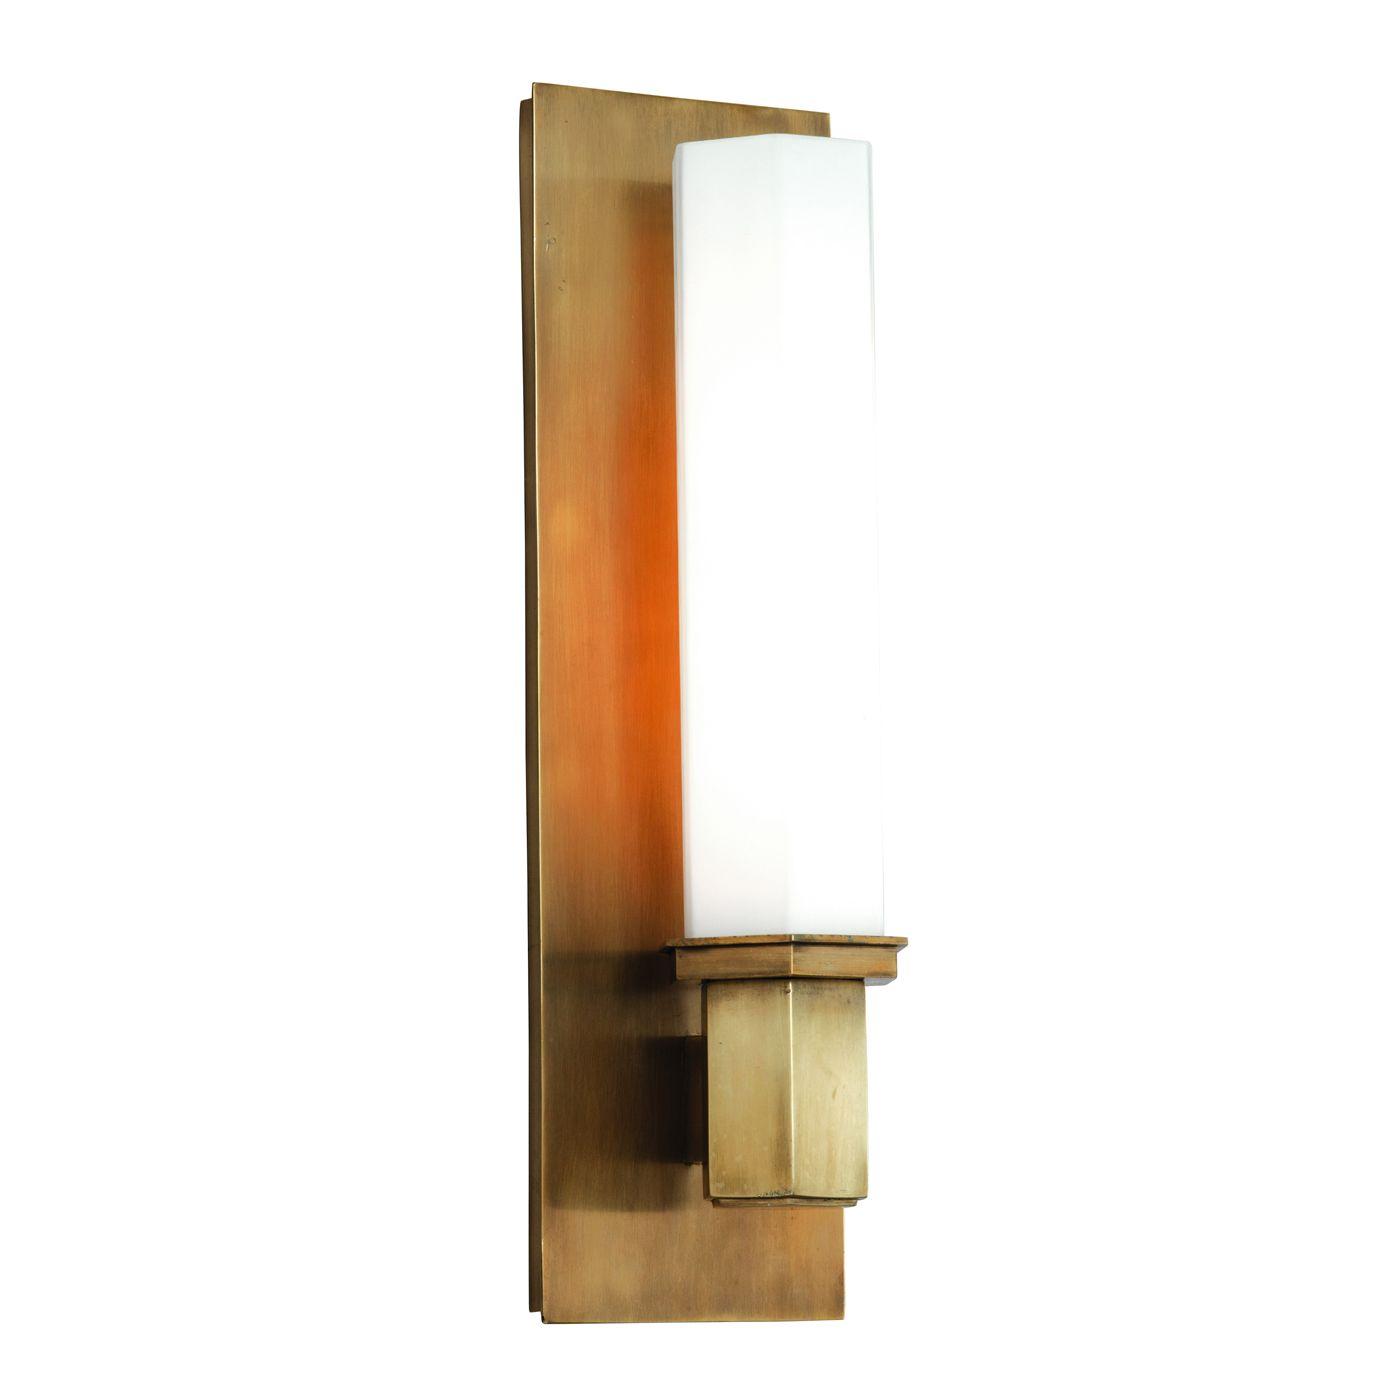 luxury lighting direct. Hudson Valley Lighting 320 Walton 1 Light Bath And Vanity | ATG Stores. DirectLuxury Luxury Direct E